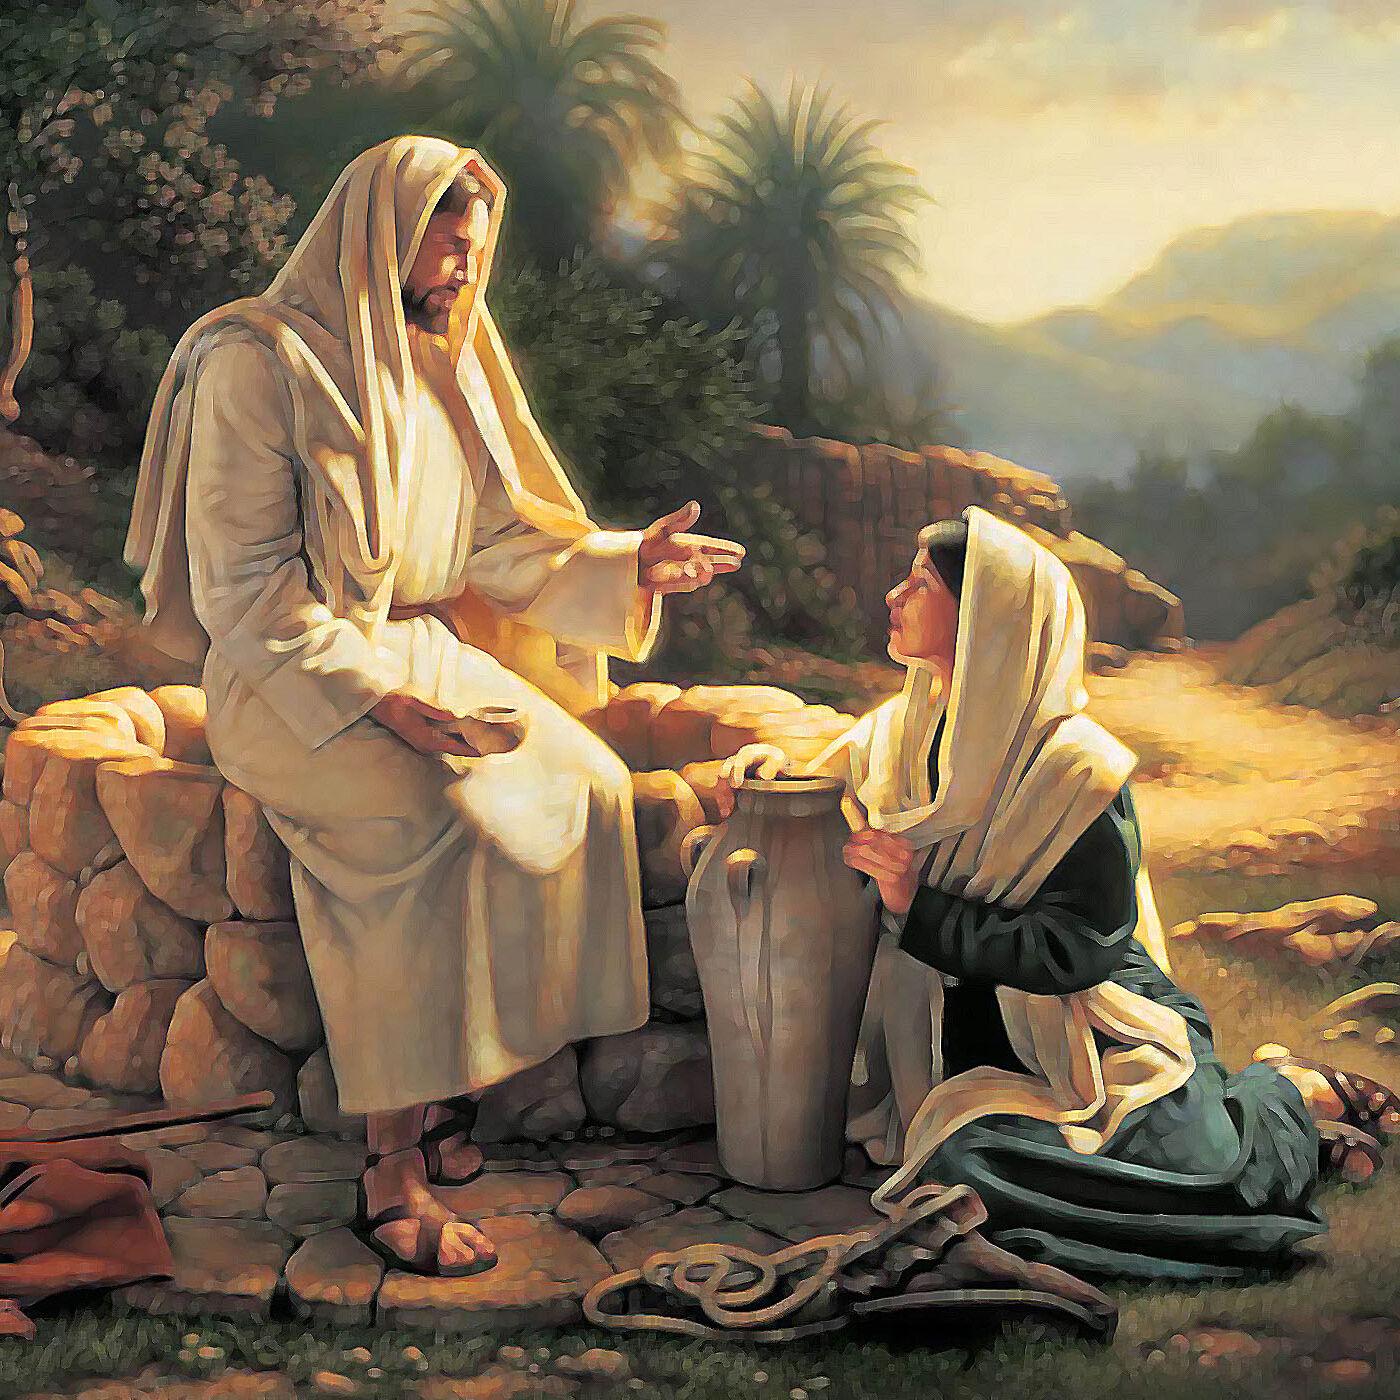 riflessioni sul Vangelo di Martedì 5 Gennaio 2021 (Gv 1, 43-51) - Apostola Loredana